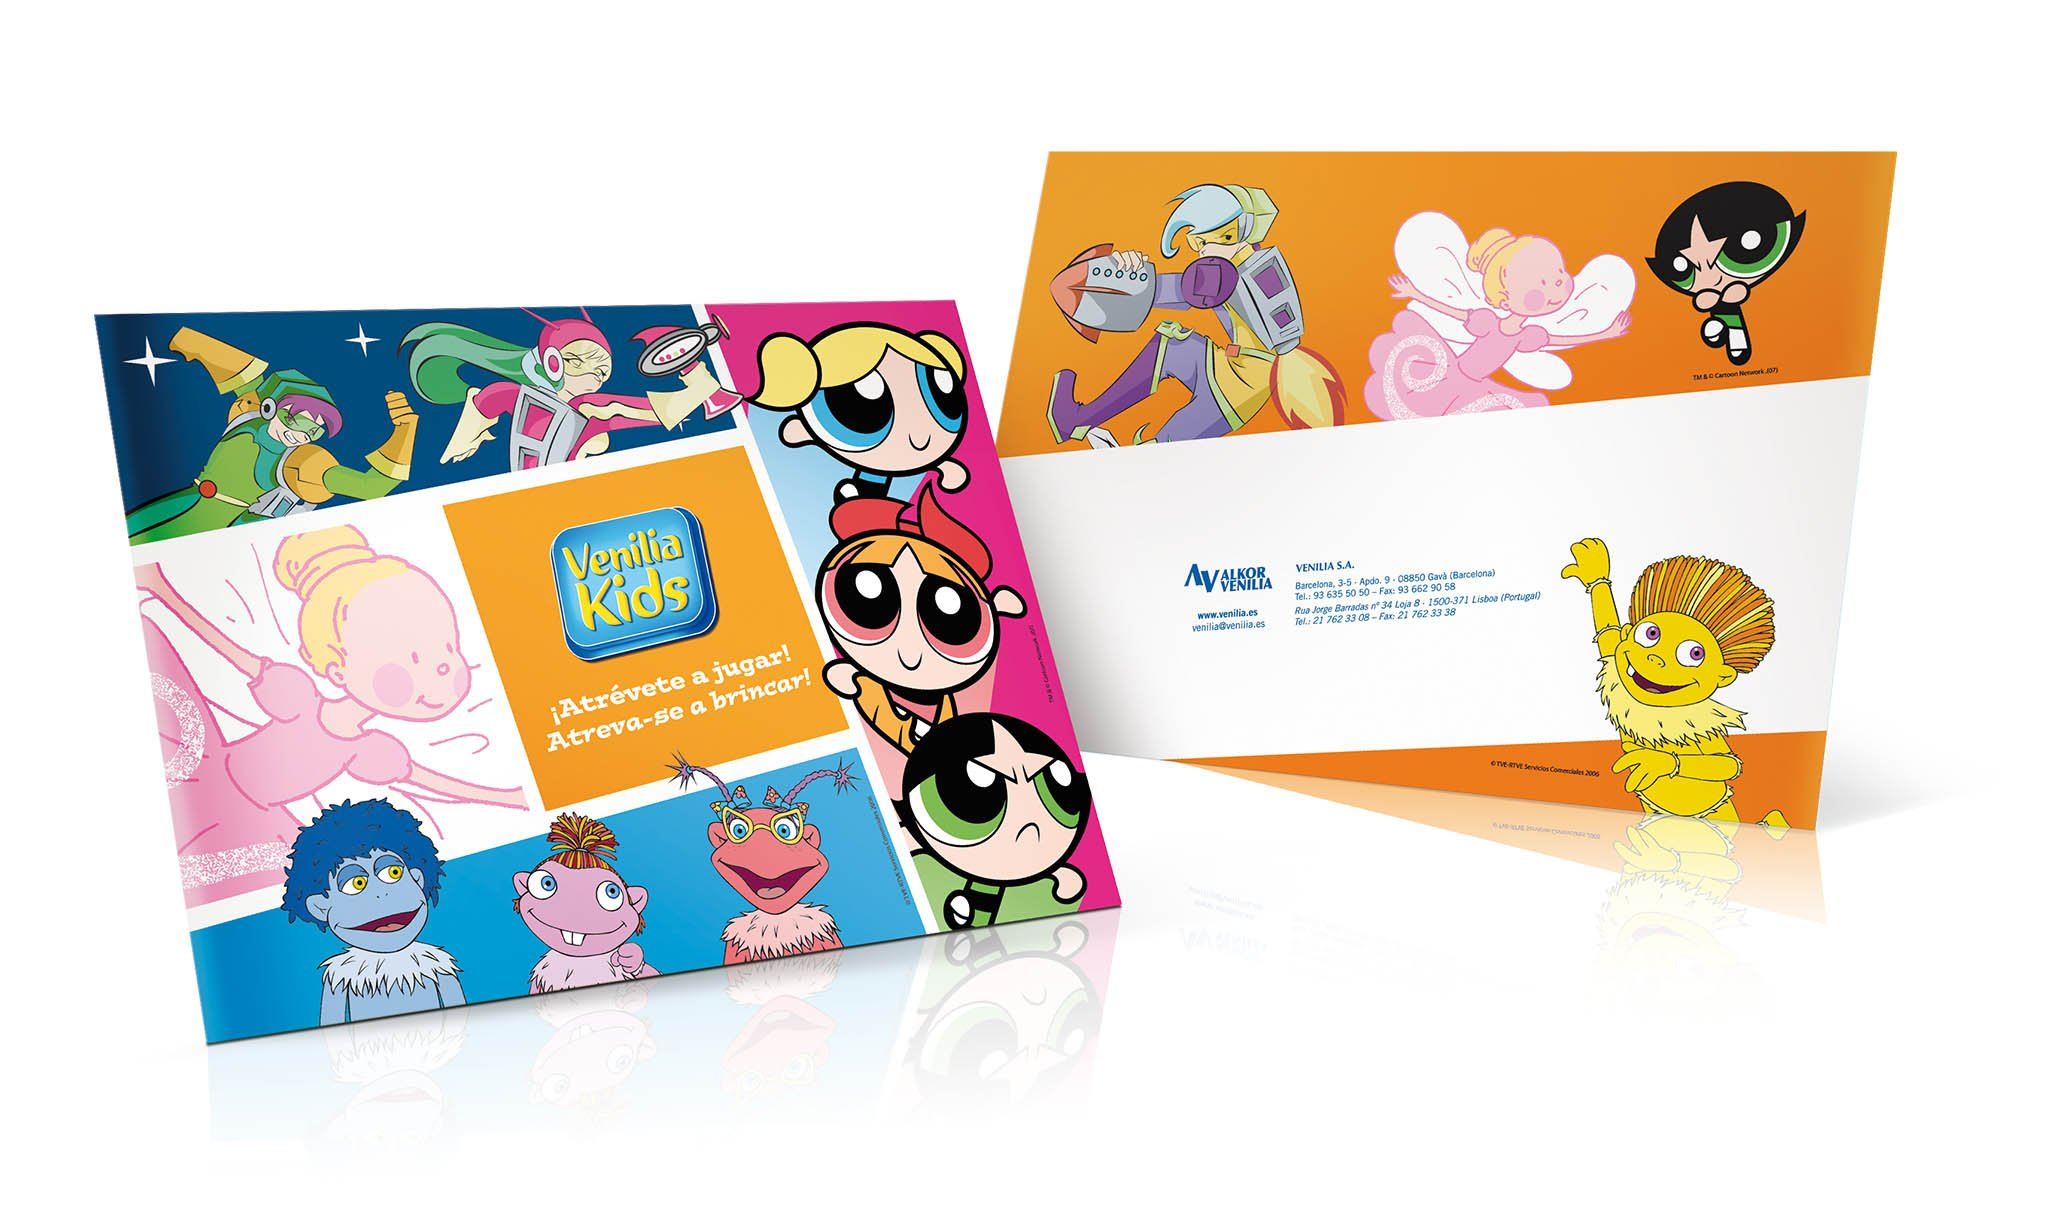 Diseño catálogo niños Venilia